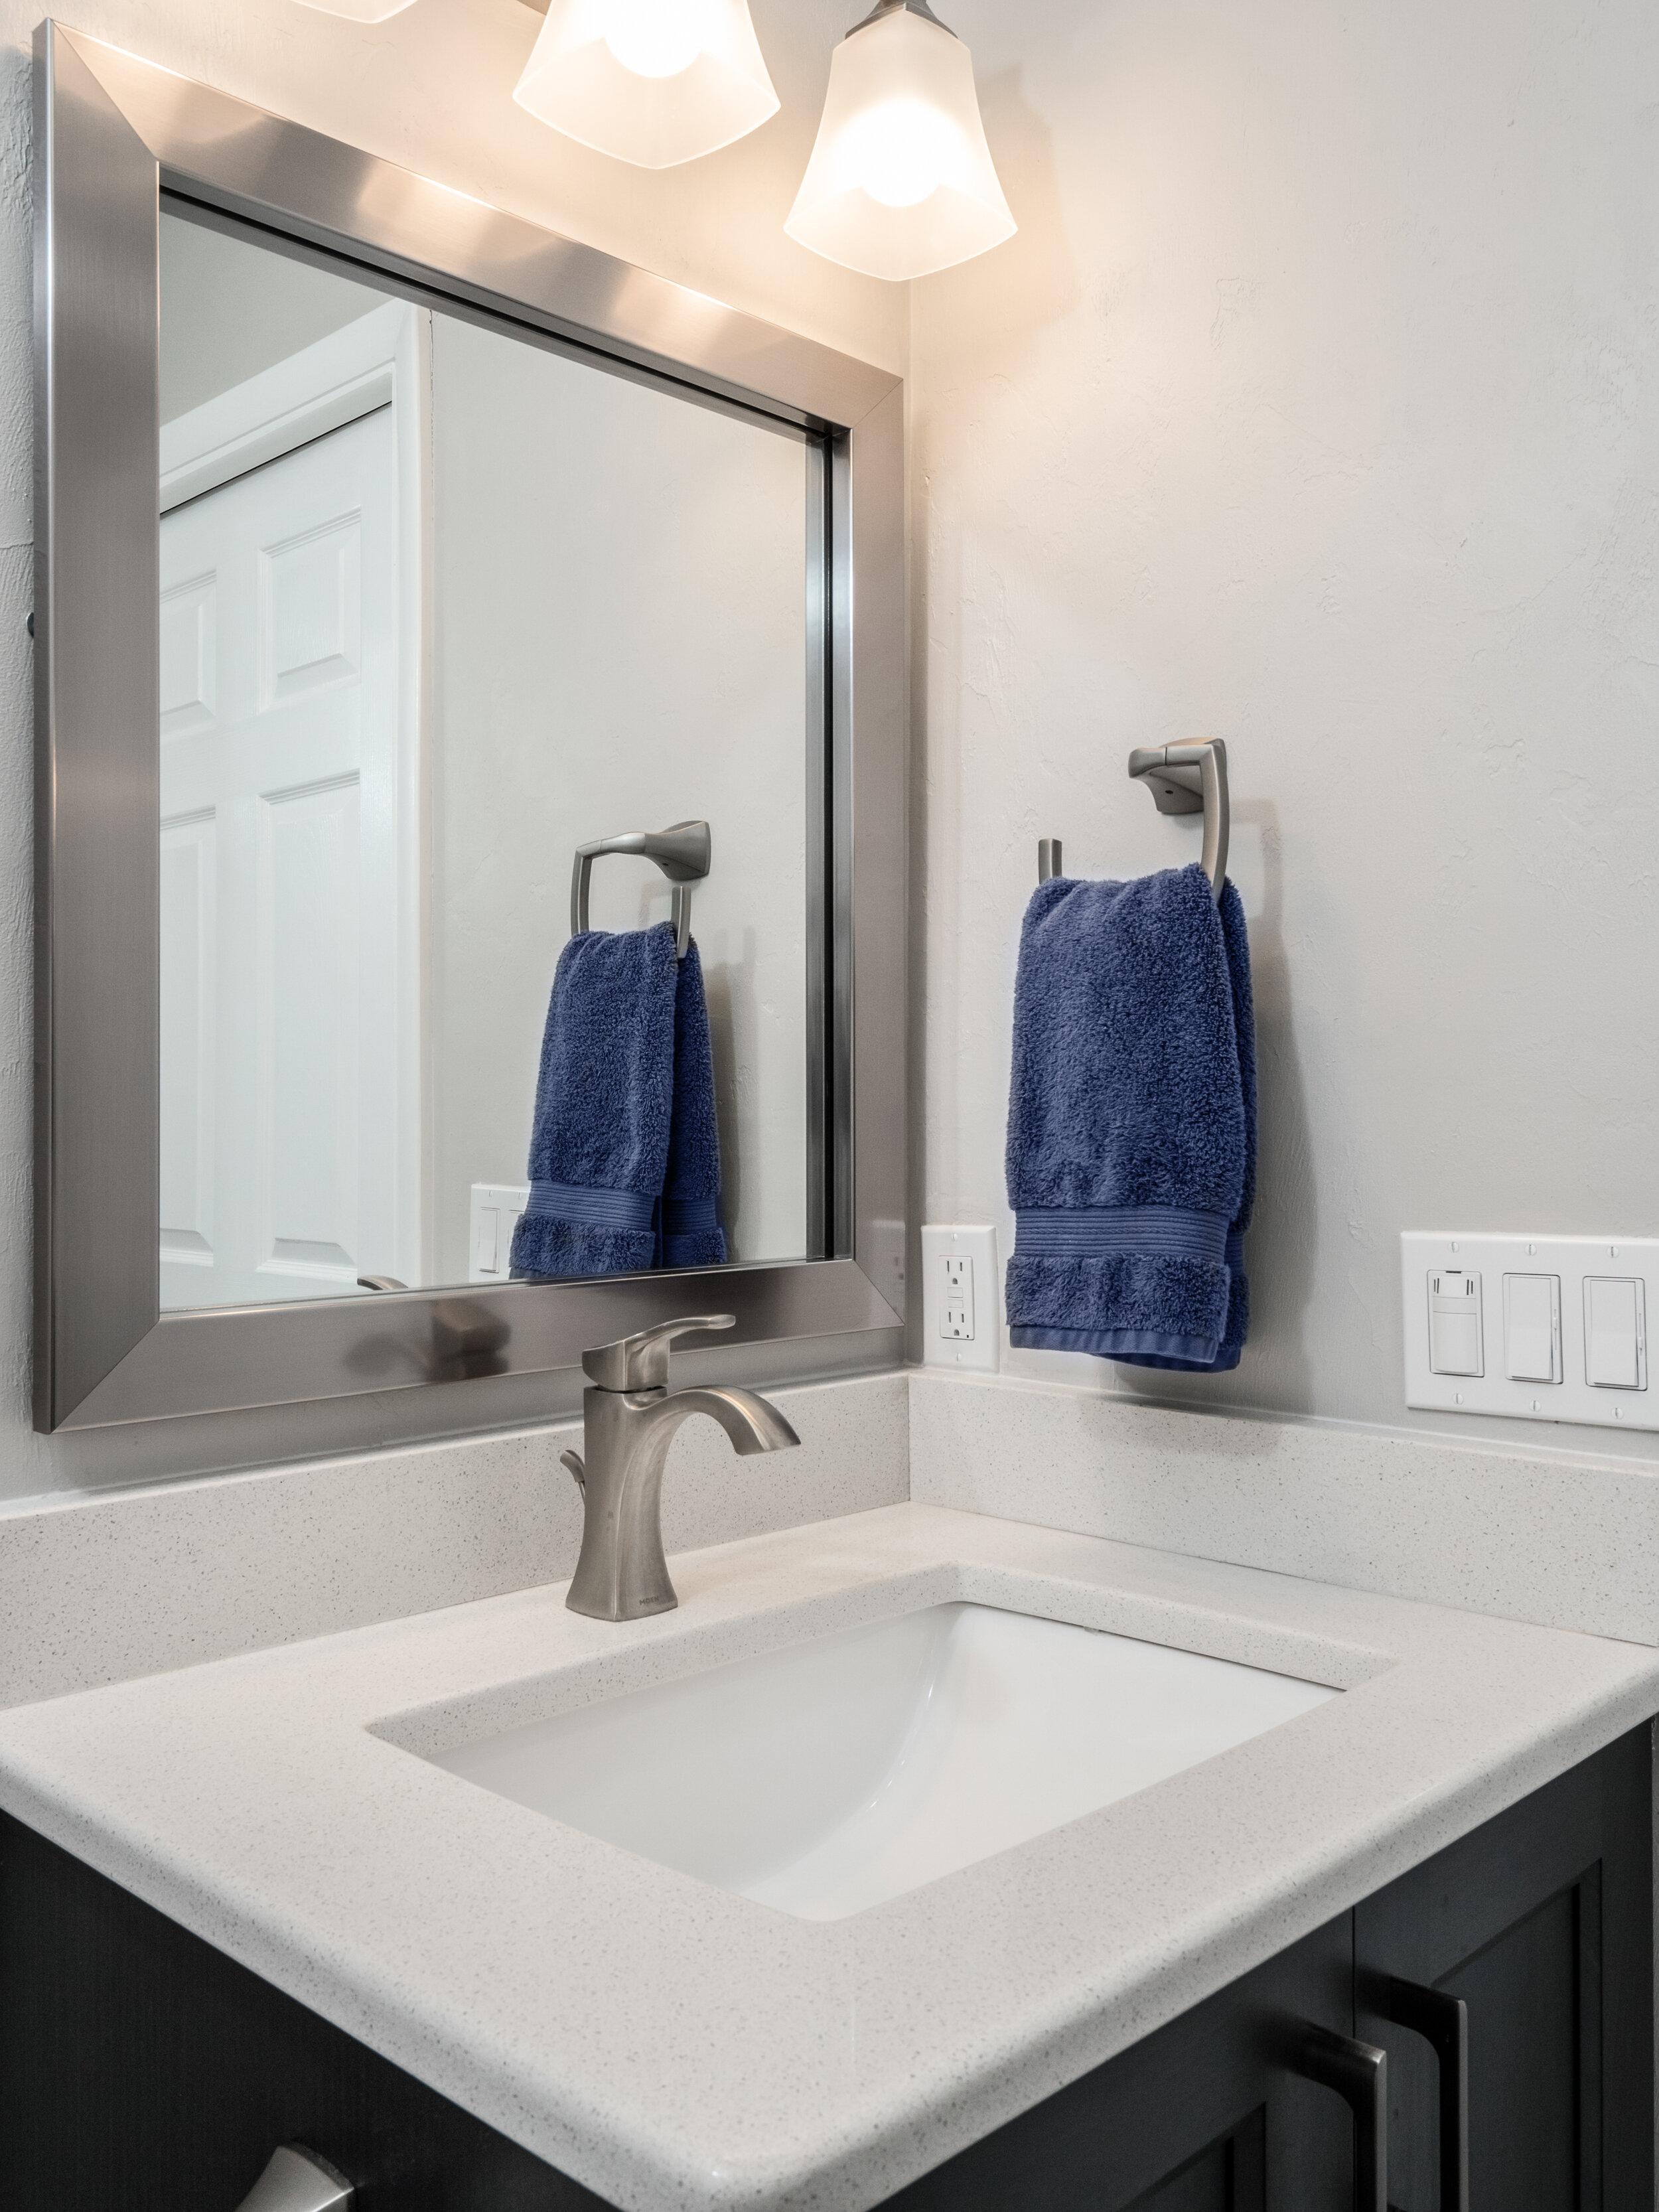 Davidson bath faucet.jpg